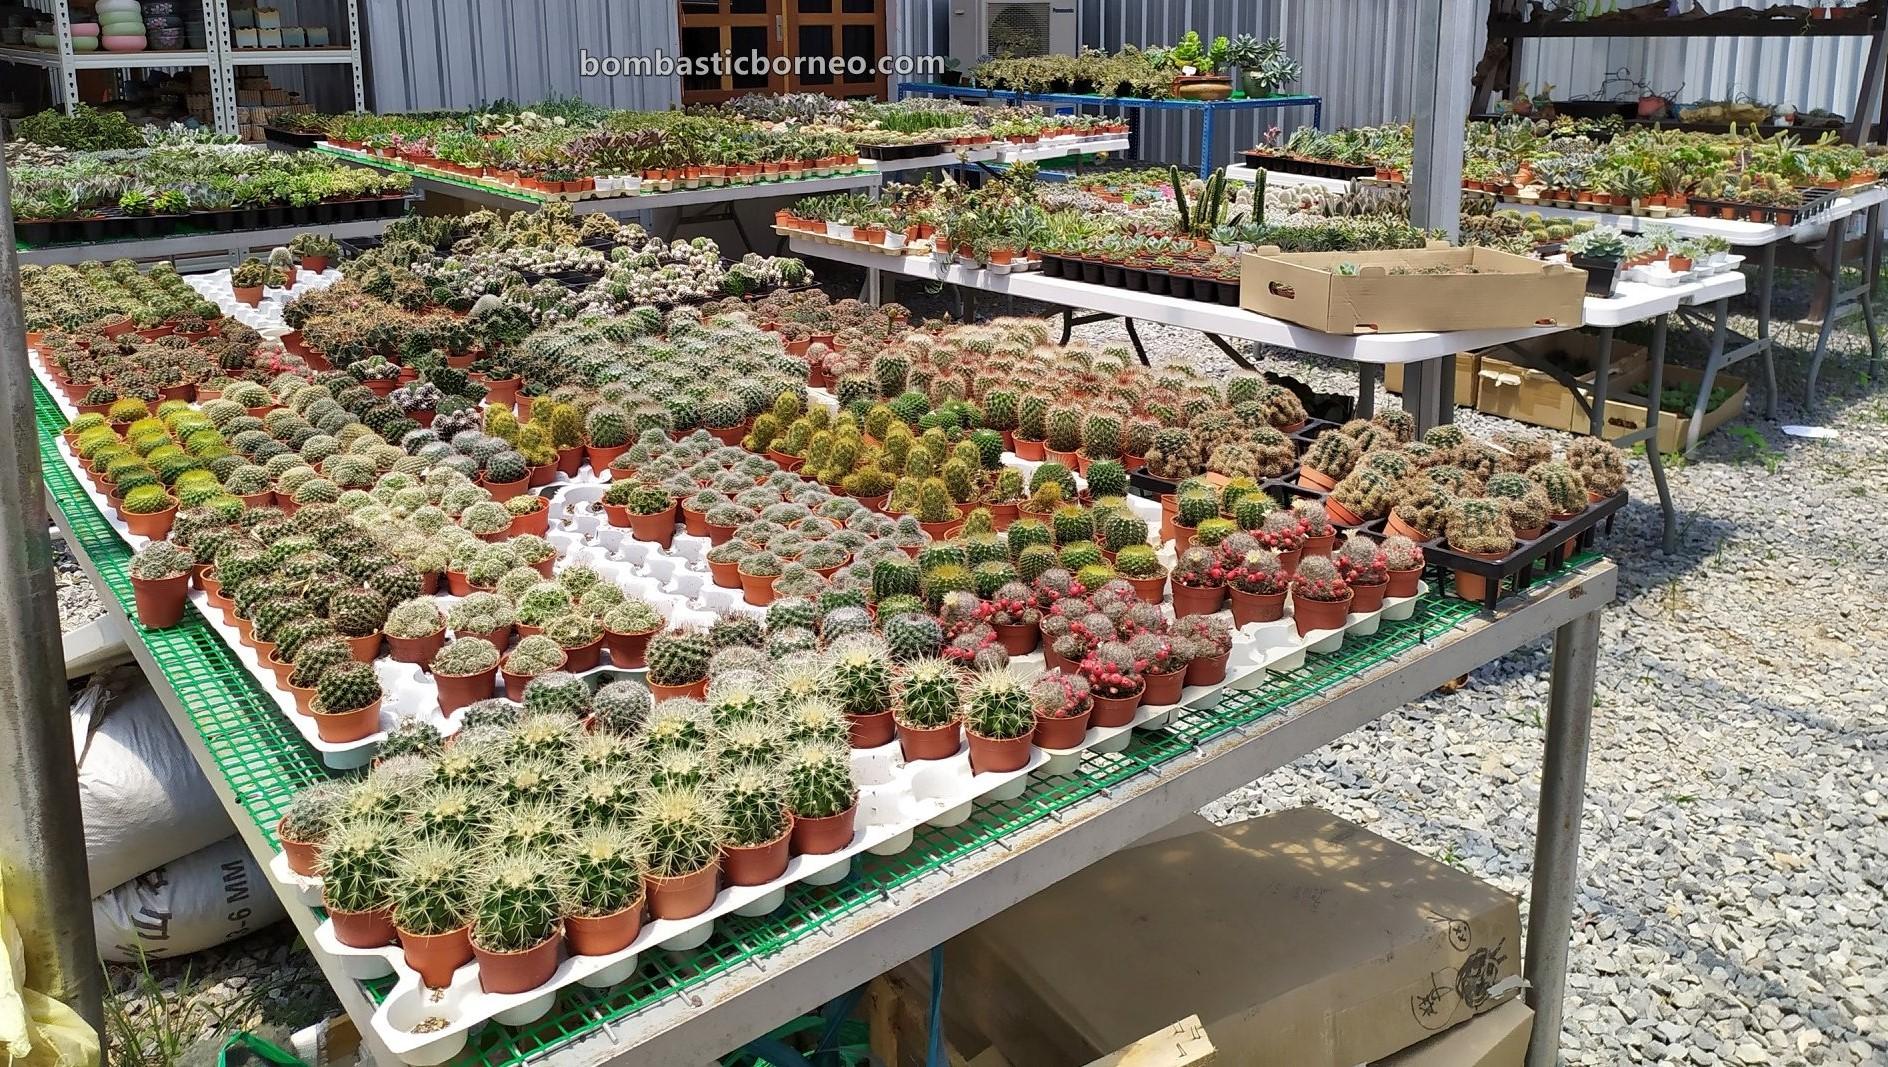 LS Succulent Garden, cacti, Ornamental Plants, Tanaman Kaktus, backpackers, destination, exploration, hobby, Tourism, Travel Guide, Trans Borneo, 穿越婆罗洲马来西亚, 砂拉越美里旅游景点, 雷氏多肉植物花圃,